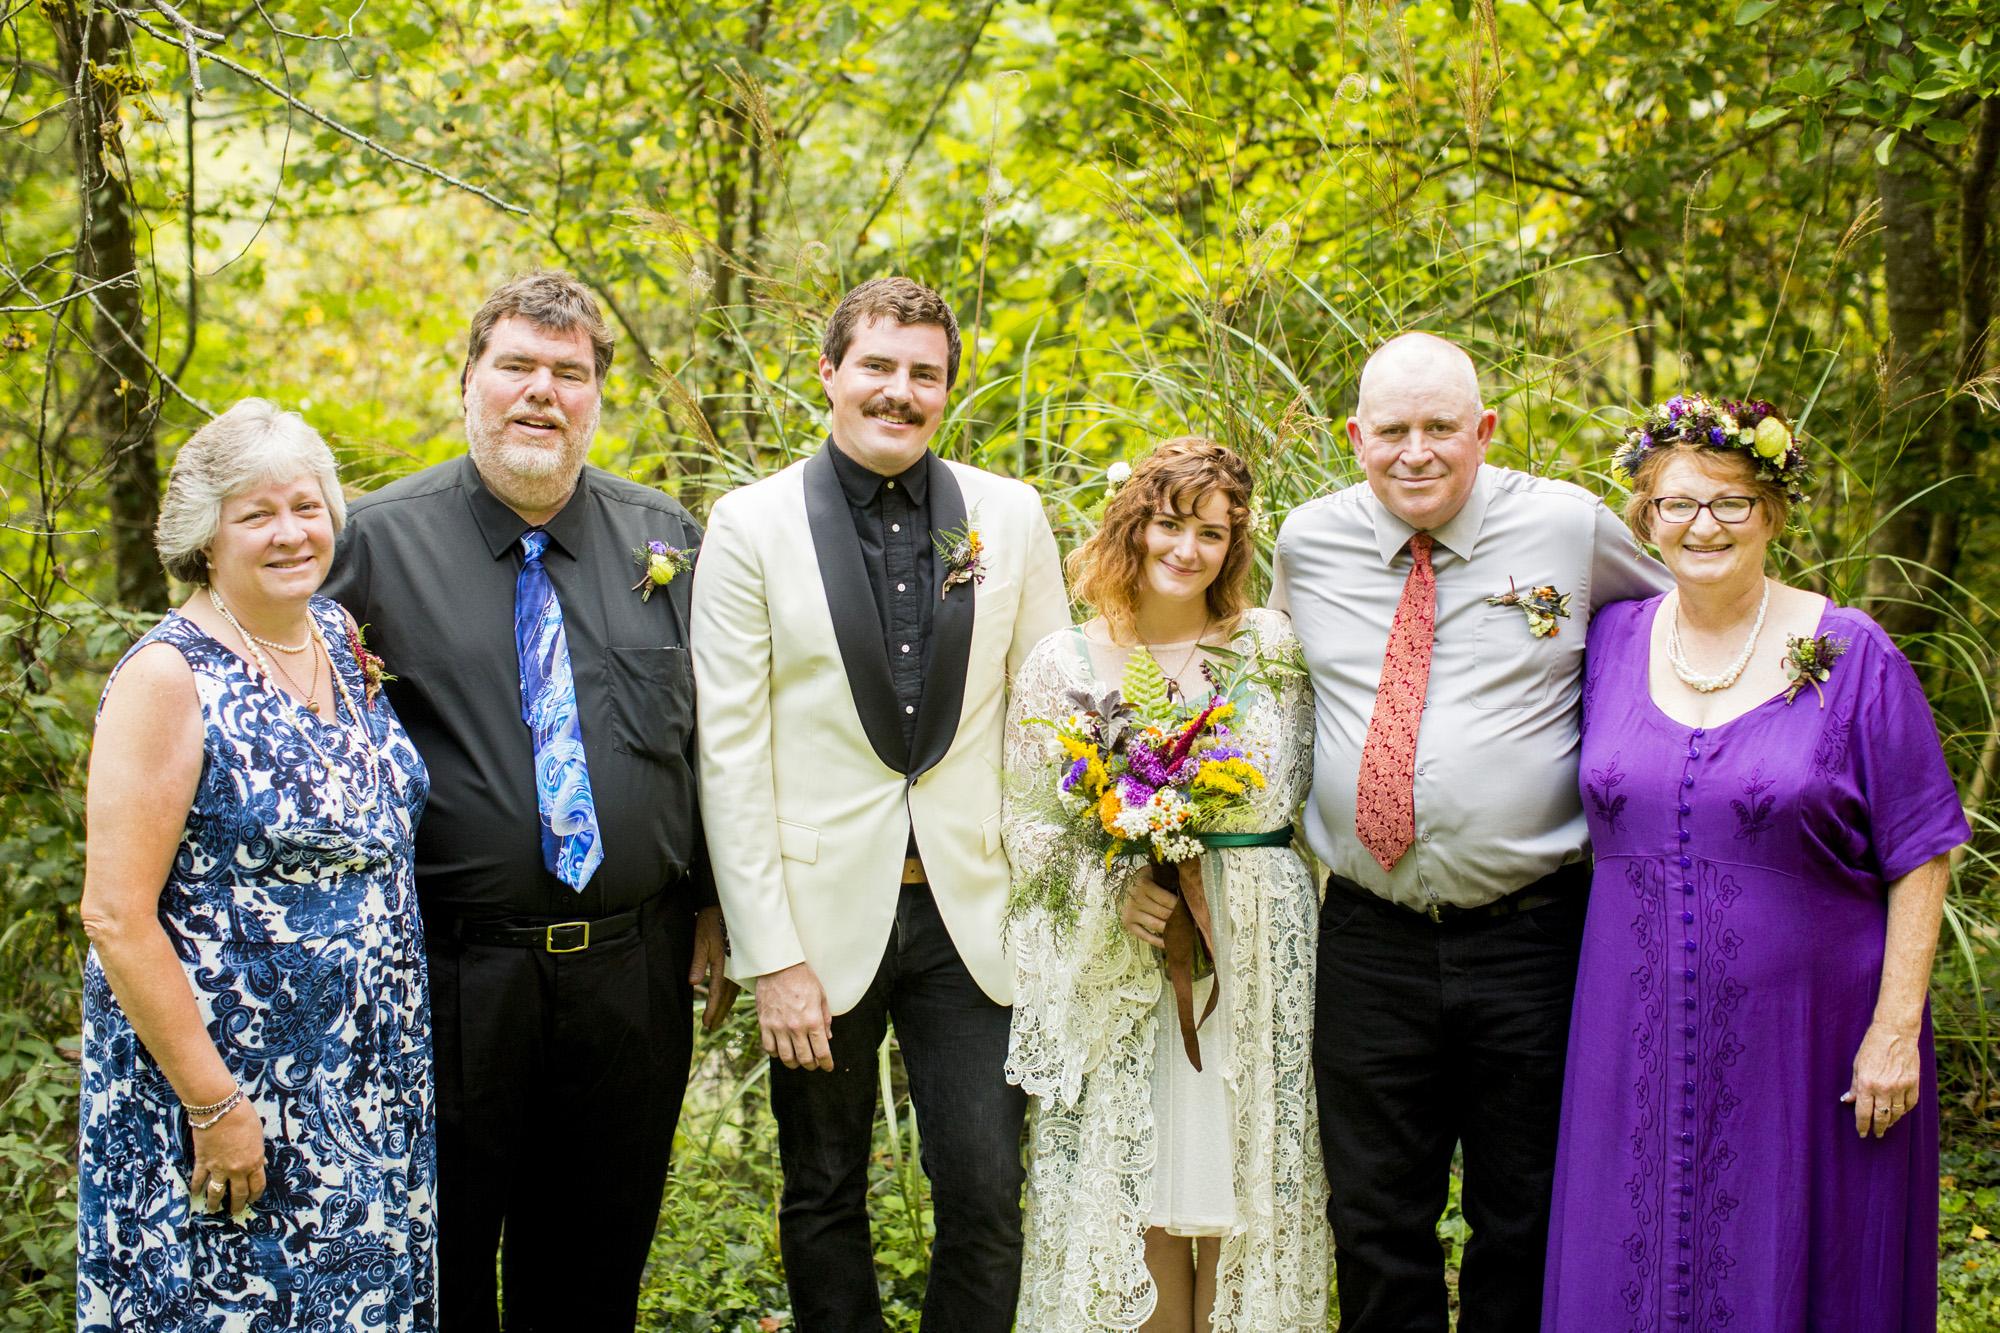 Seriously_Sabrina_Photography_Red_River_Gorge_Kentucky_Wedding_ShawnDana87.jpg